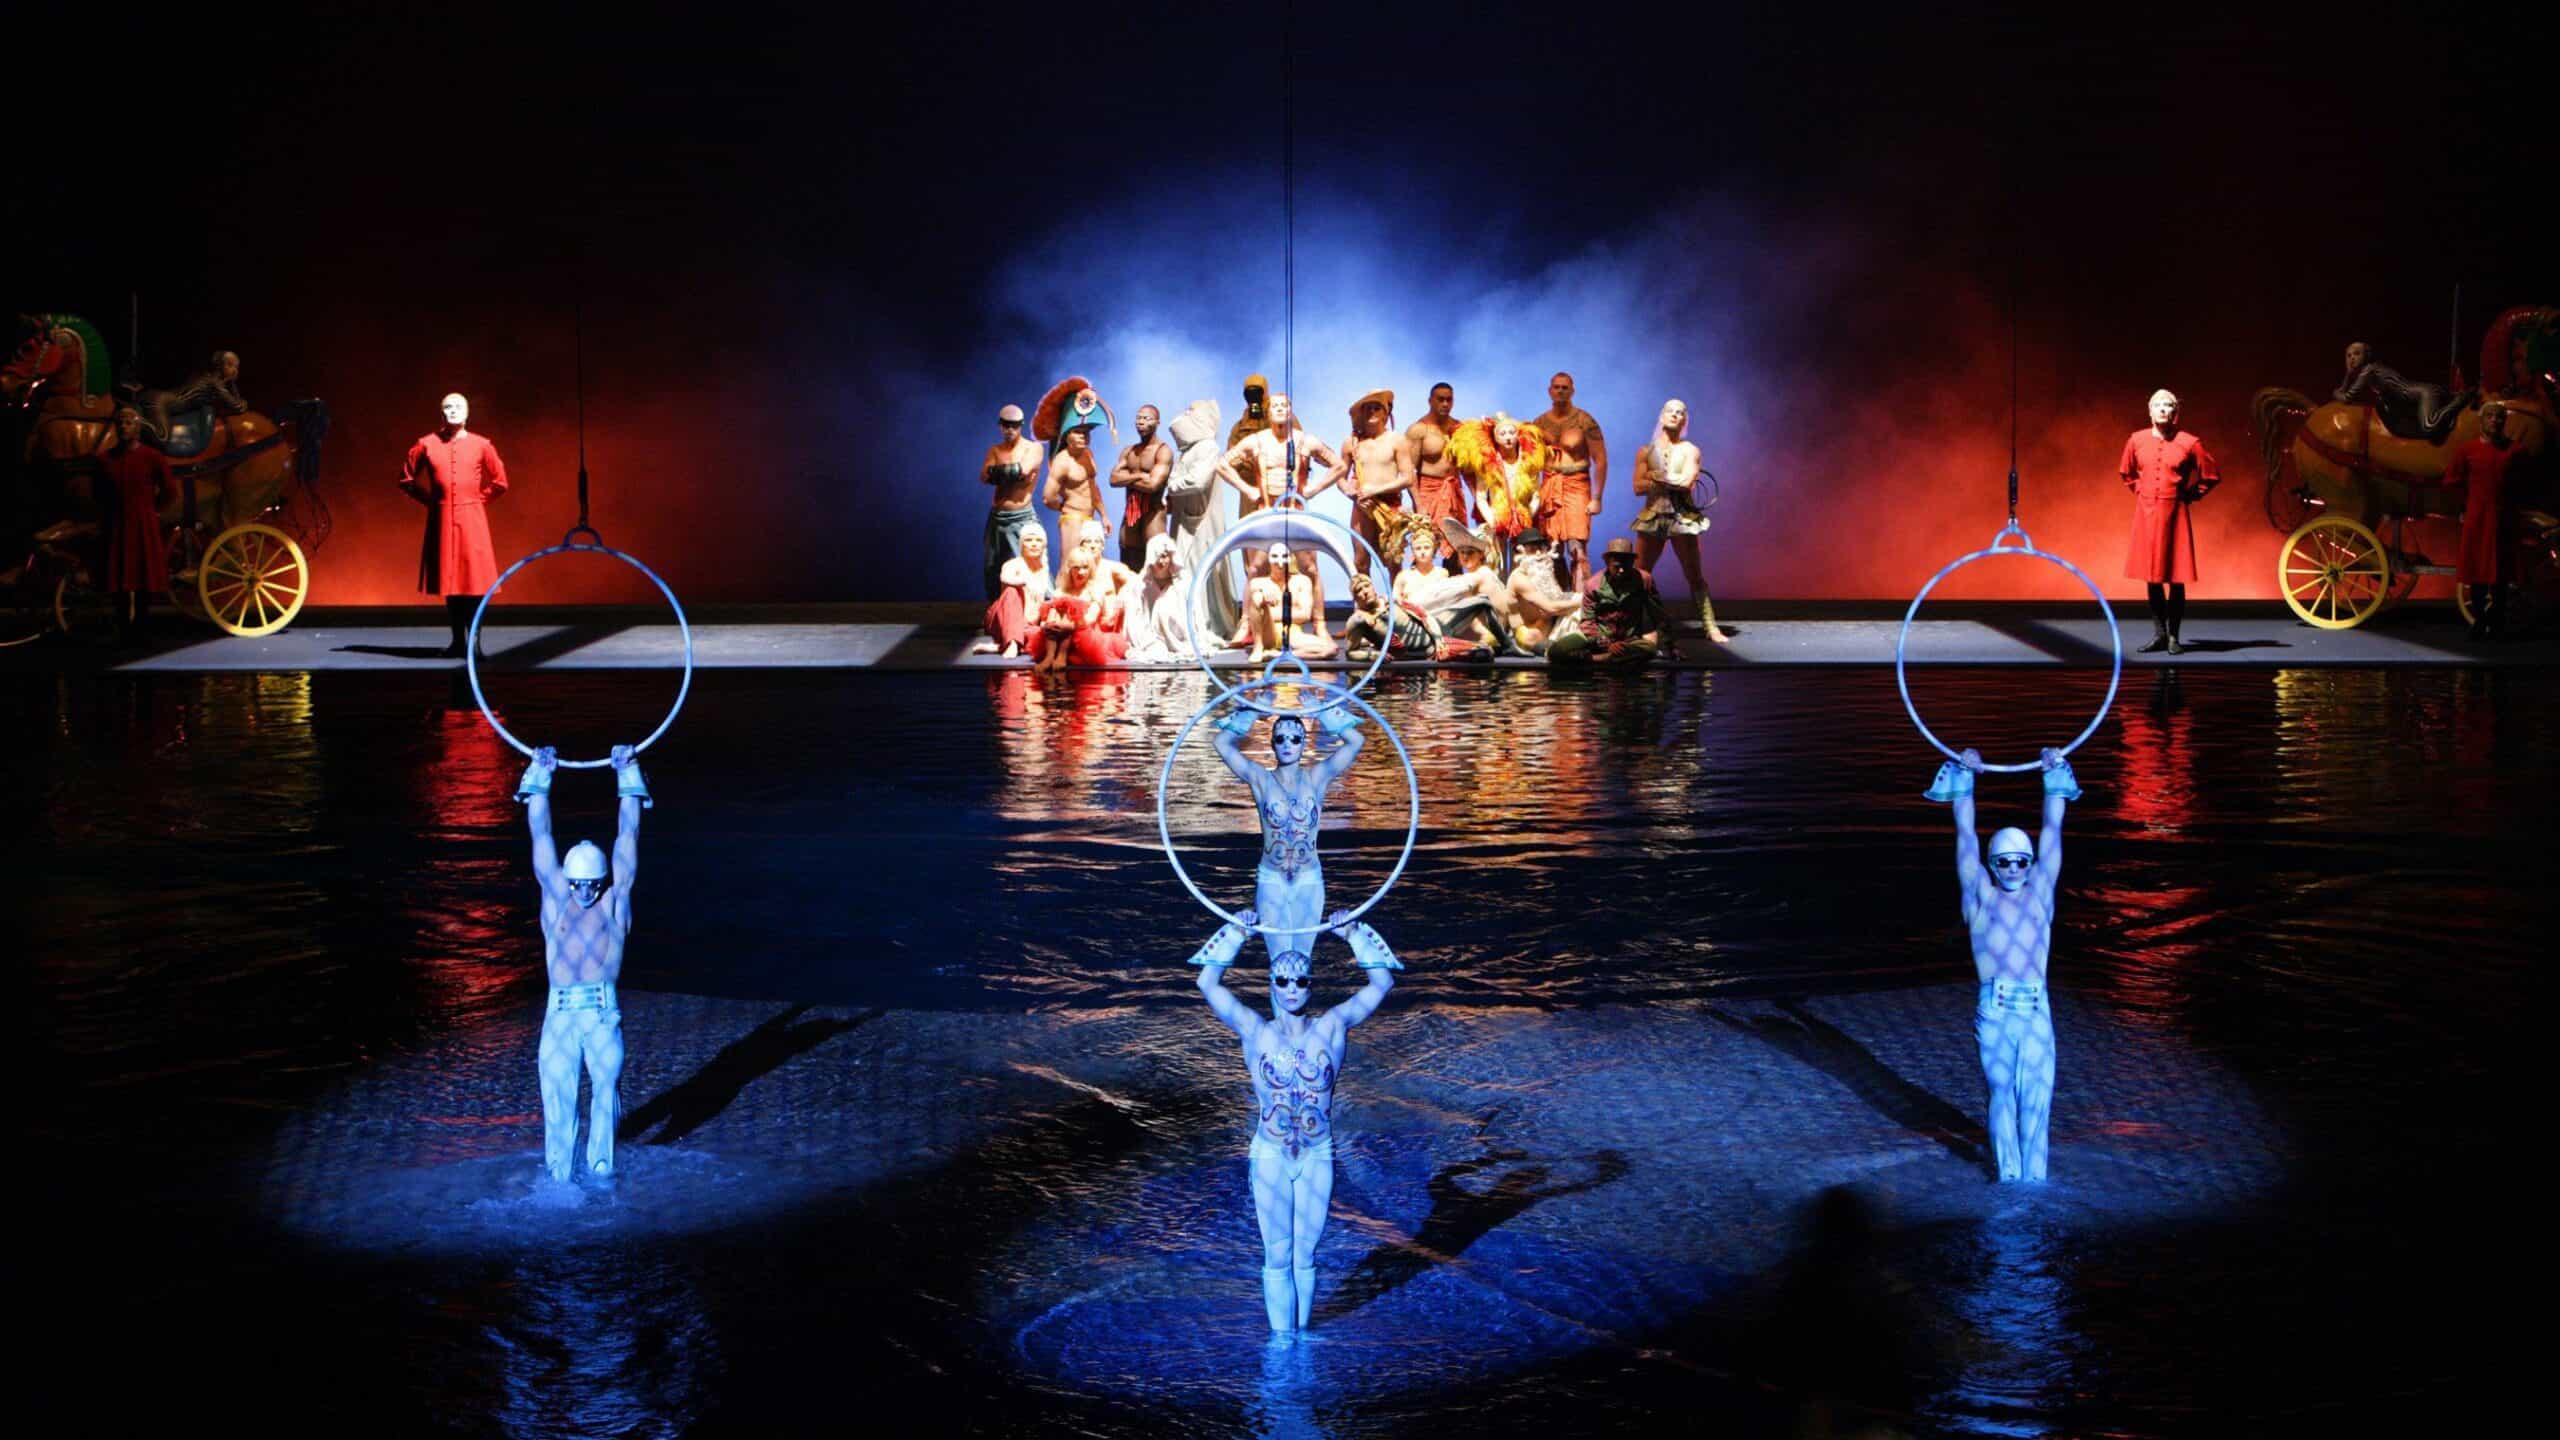 spectacle o cirque du soleil